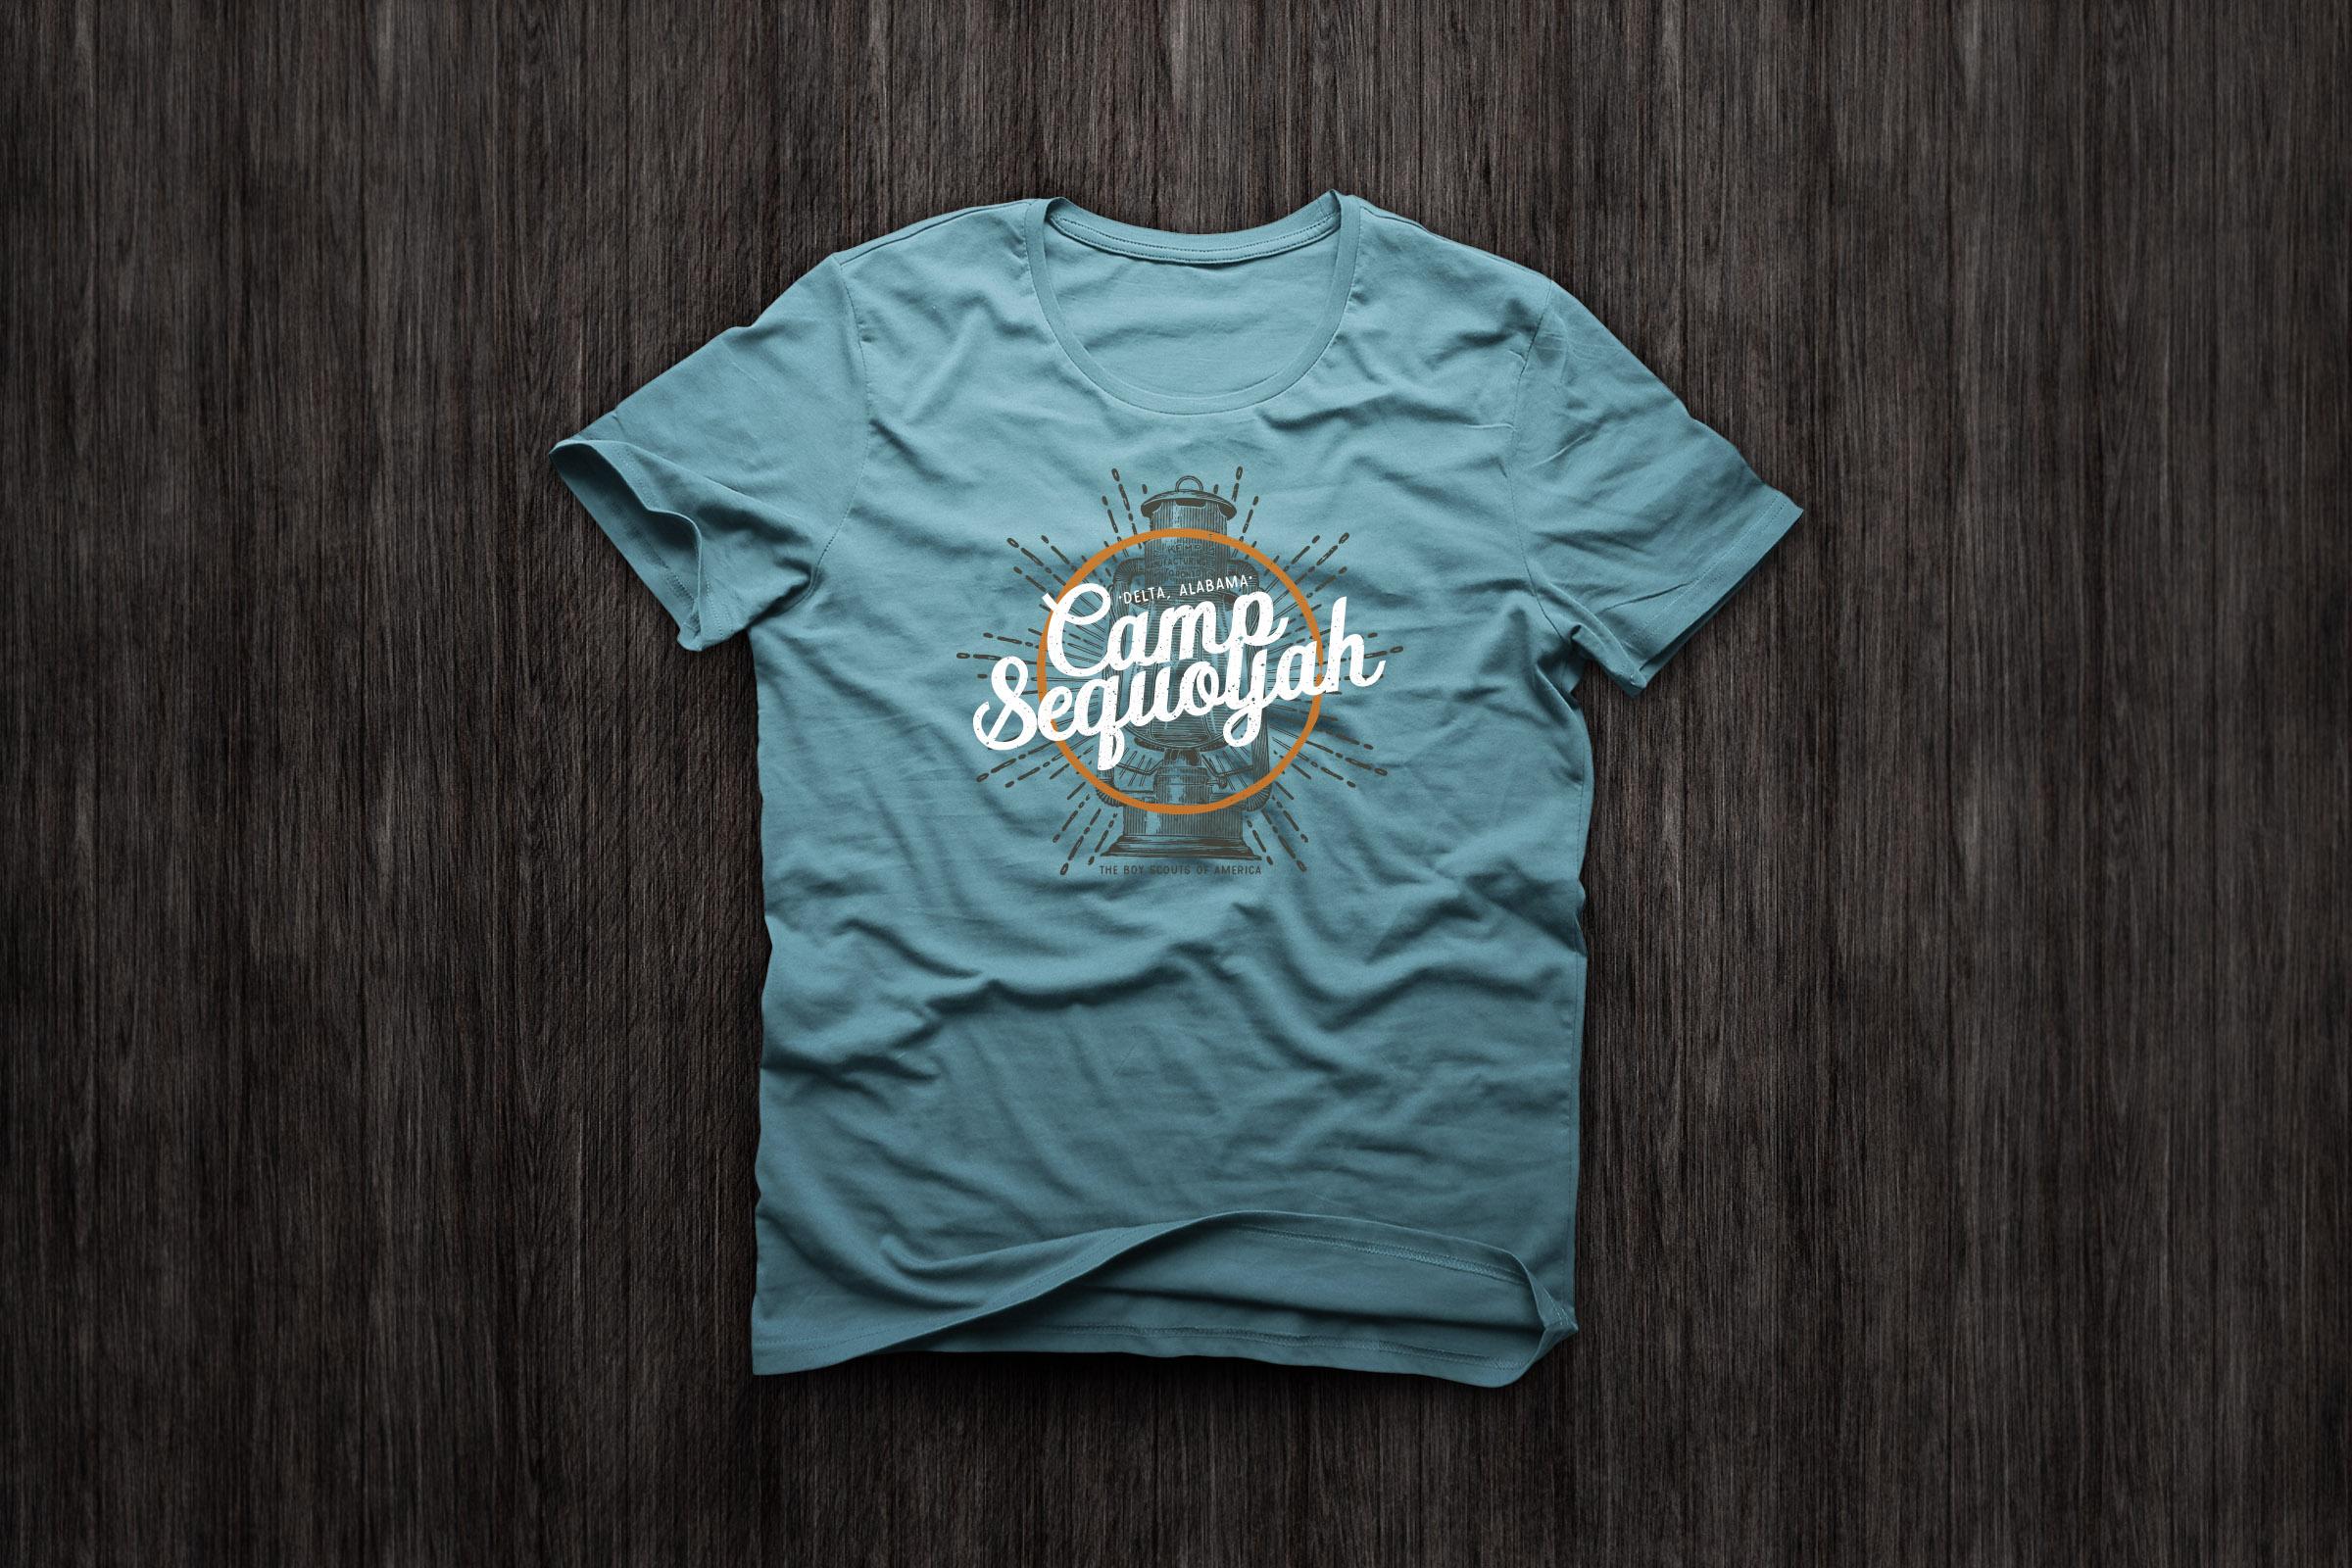 CampSequoyah_Shirt1.jpg